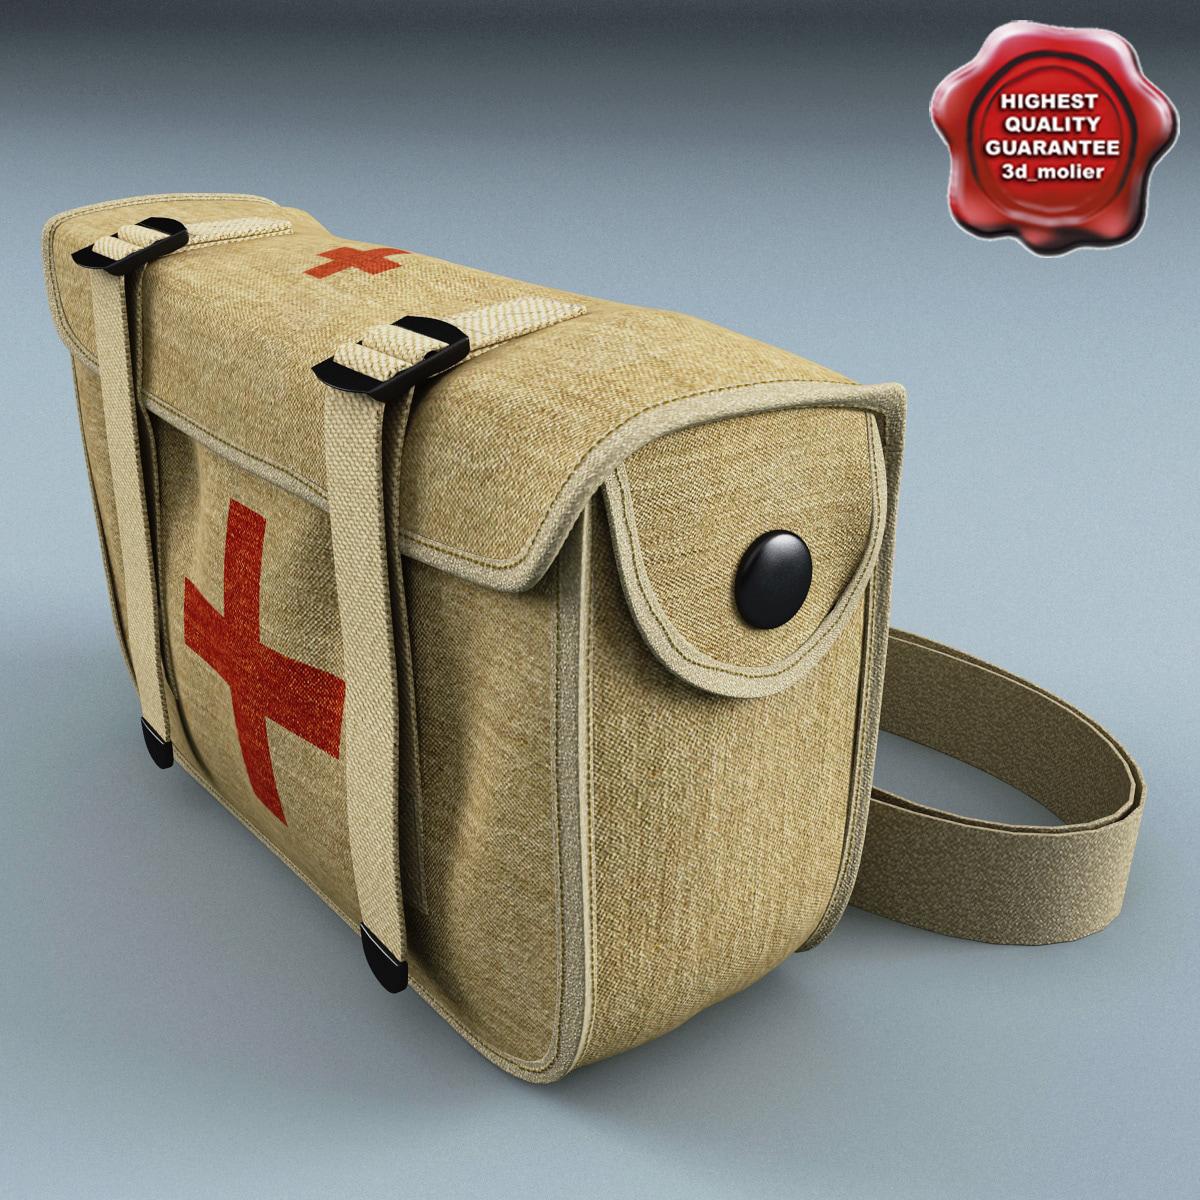 Military_First_Aid_Kit_00.jpg